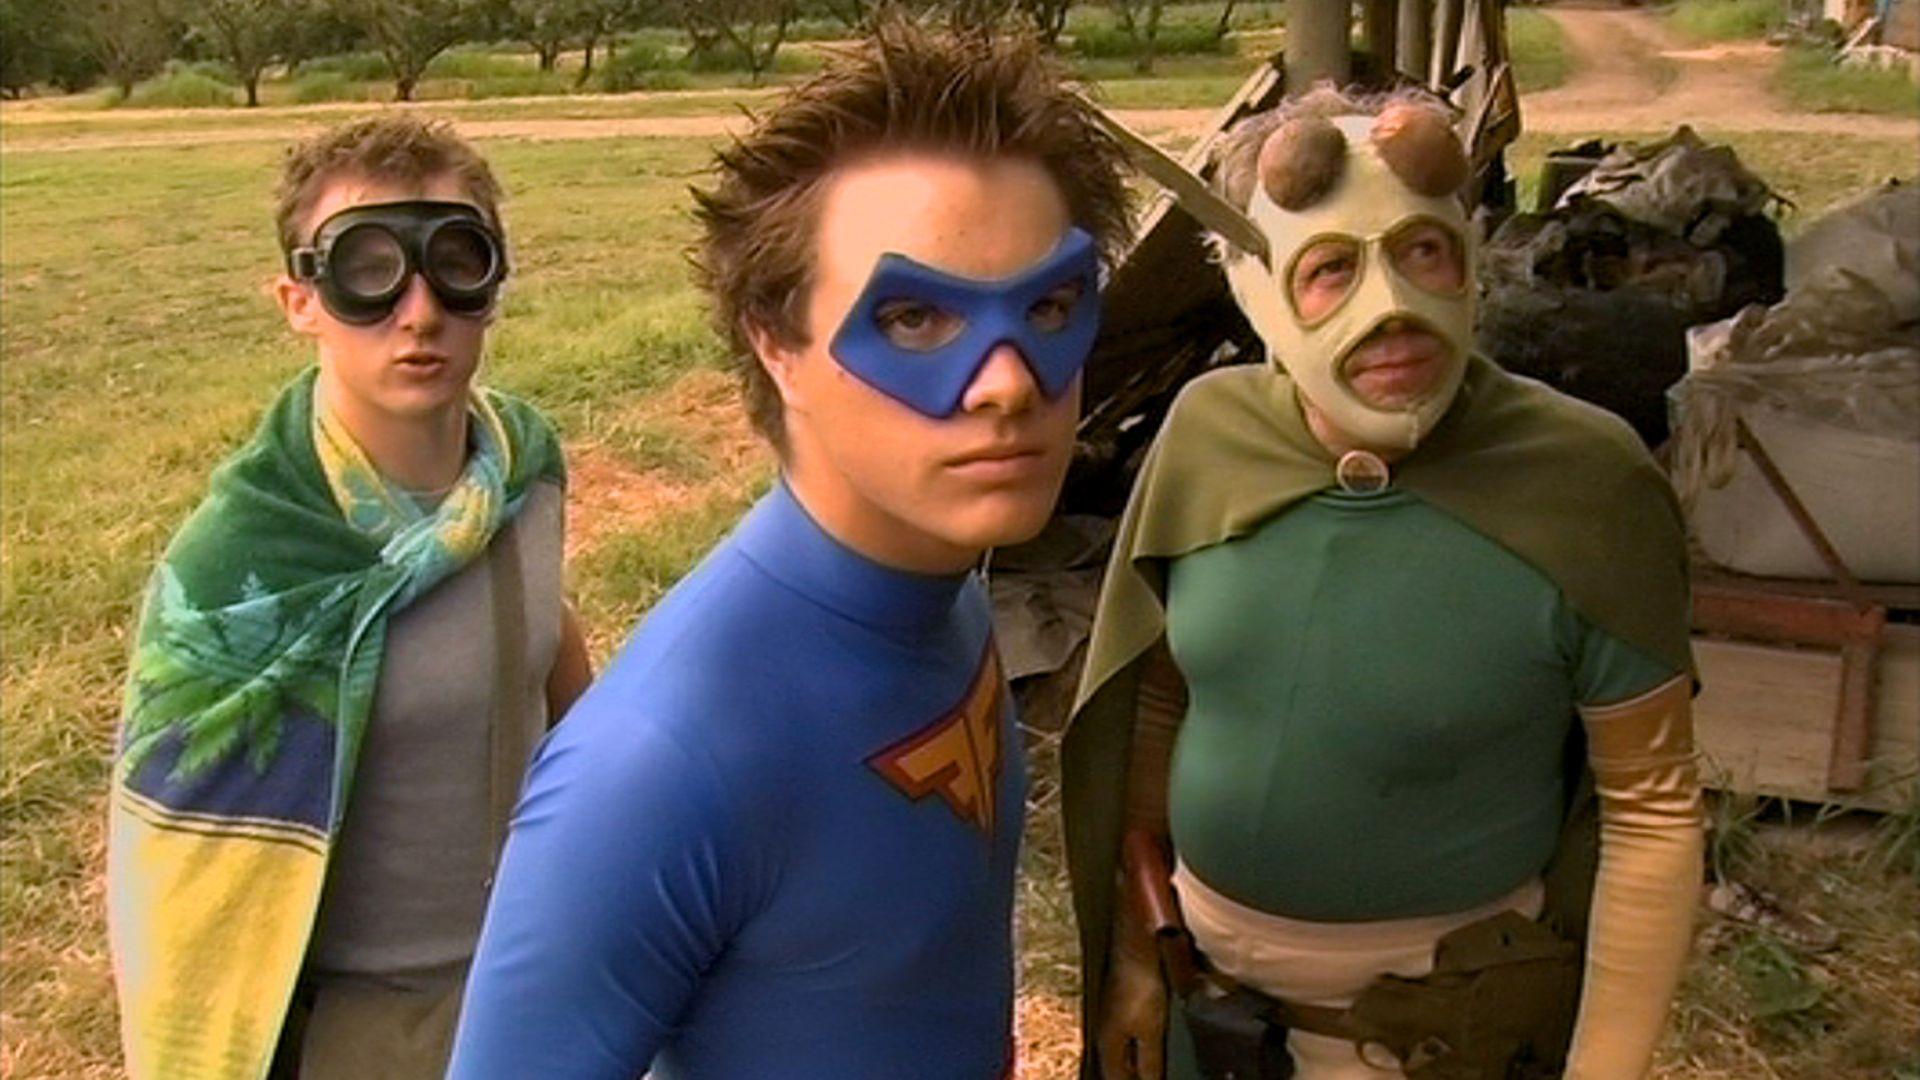 The Amazing Extraordinary Friends Season 2: Where To Watch